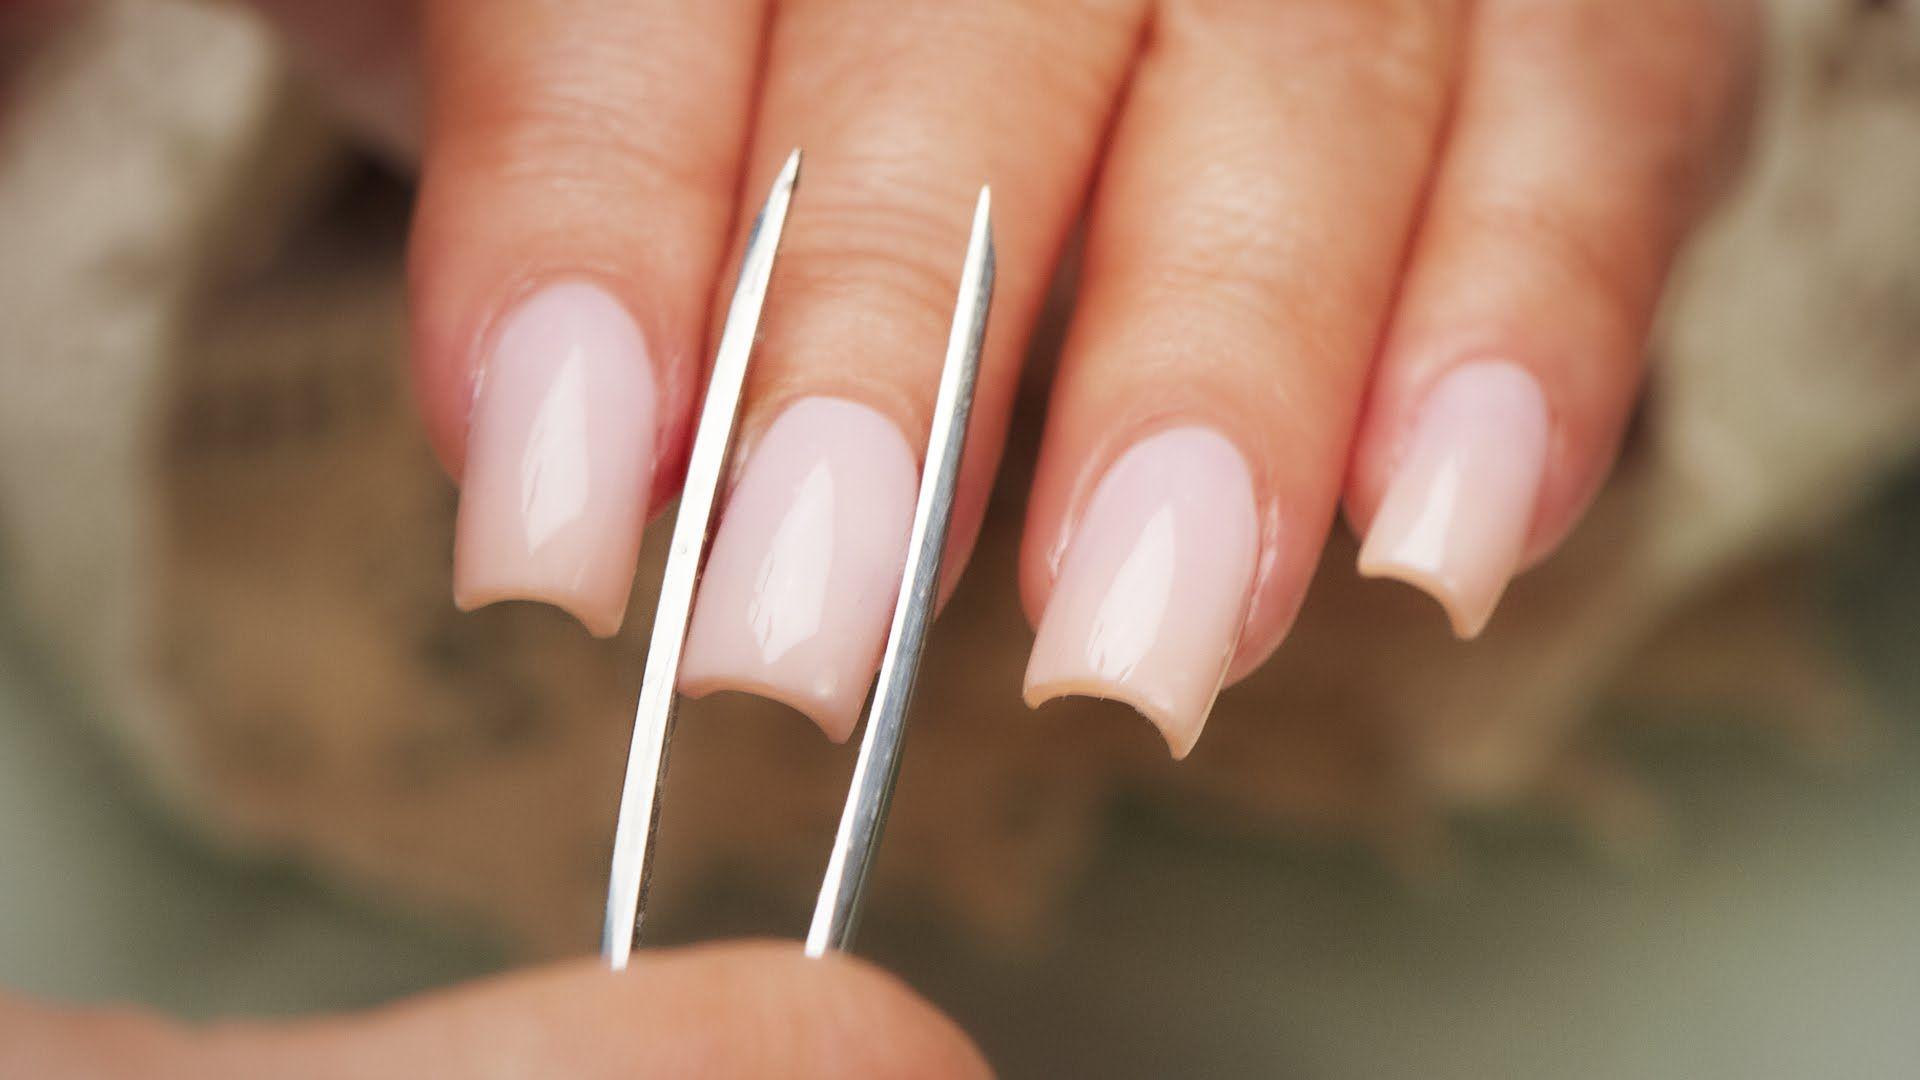 Pinching Acrylic Nails Step By Step Tutorial Youtube Diy Acrylic Nails Diy Nail Designs Acrylic Nails At Home